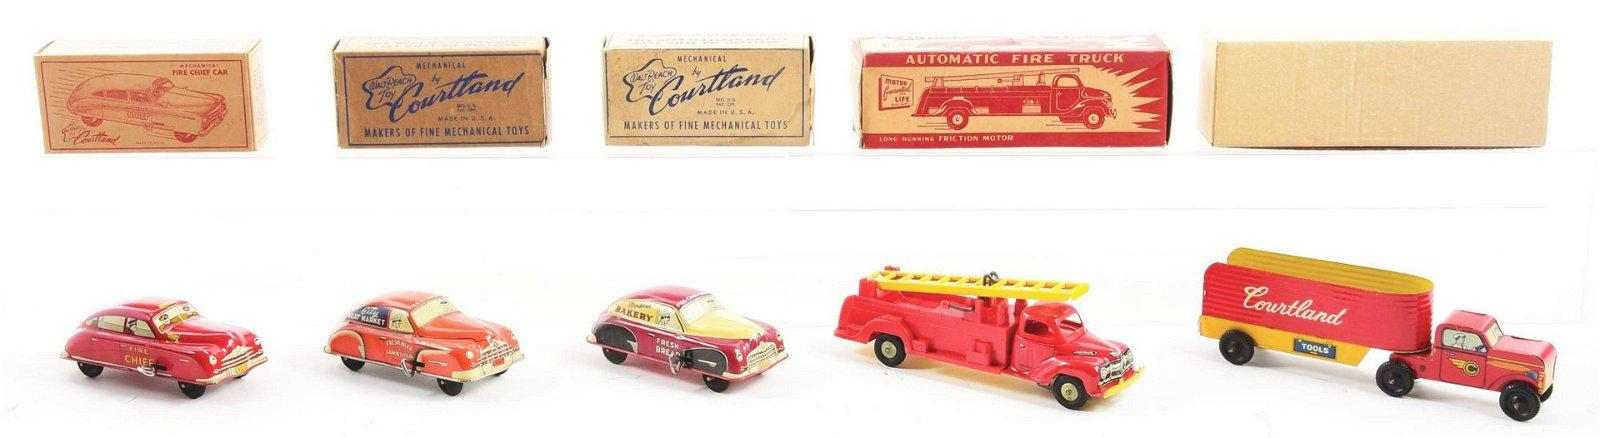 Lot of 5: Tin-Litho Cortland Vehicle Toys.